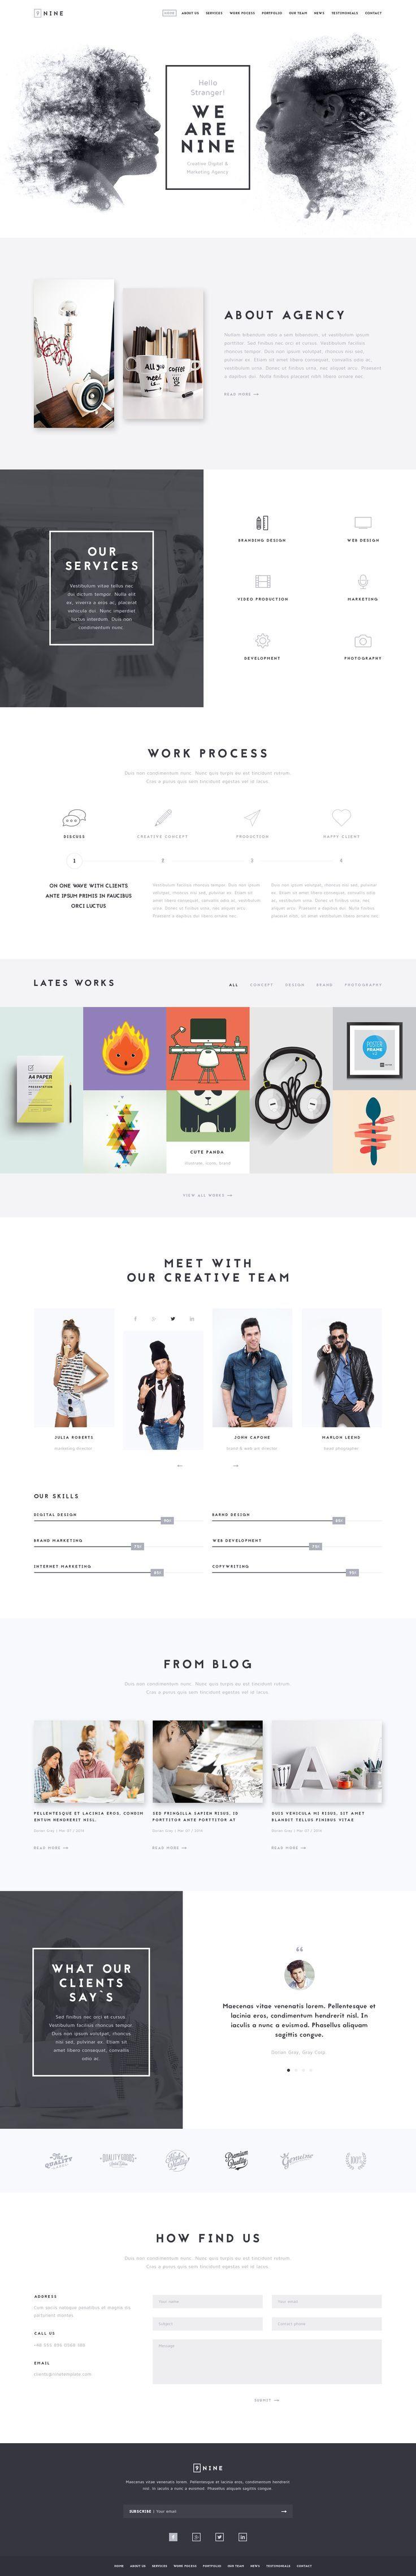 30 University And College Websites Inspiration Designyep University Website College Website Corporate Website Design